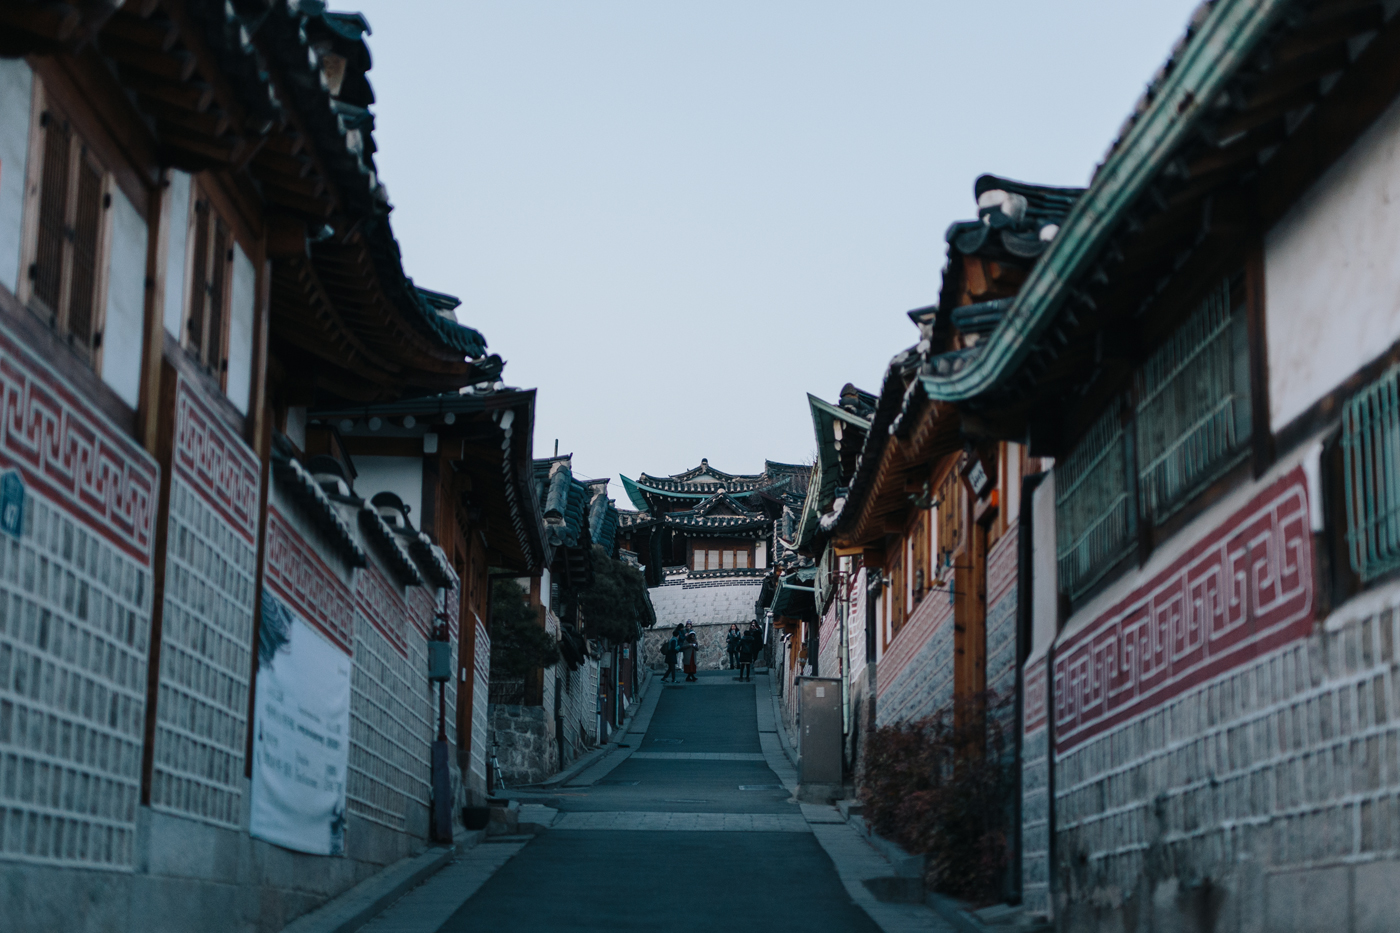 Winter in Seoul:Bukchon Hanok Village (북촌한옥마을), Seoul, South Korea.